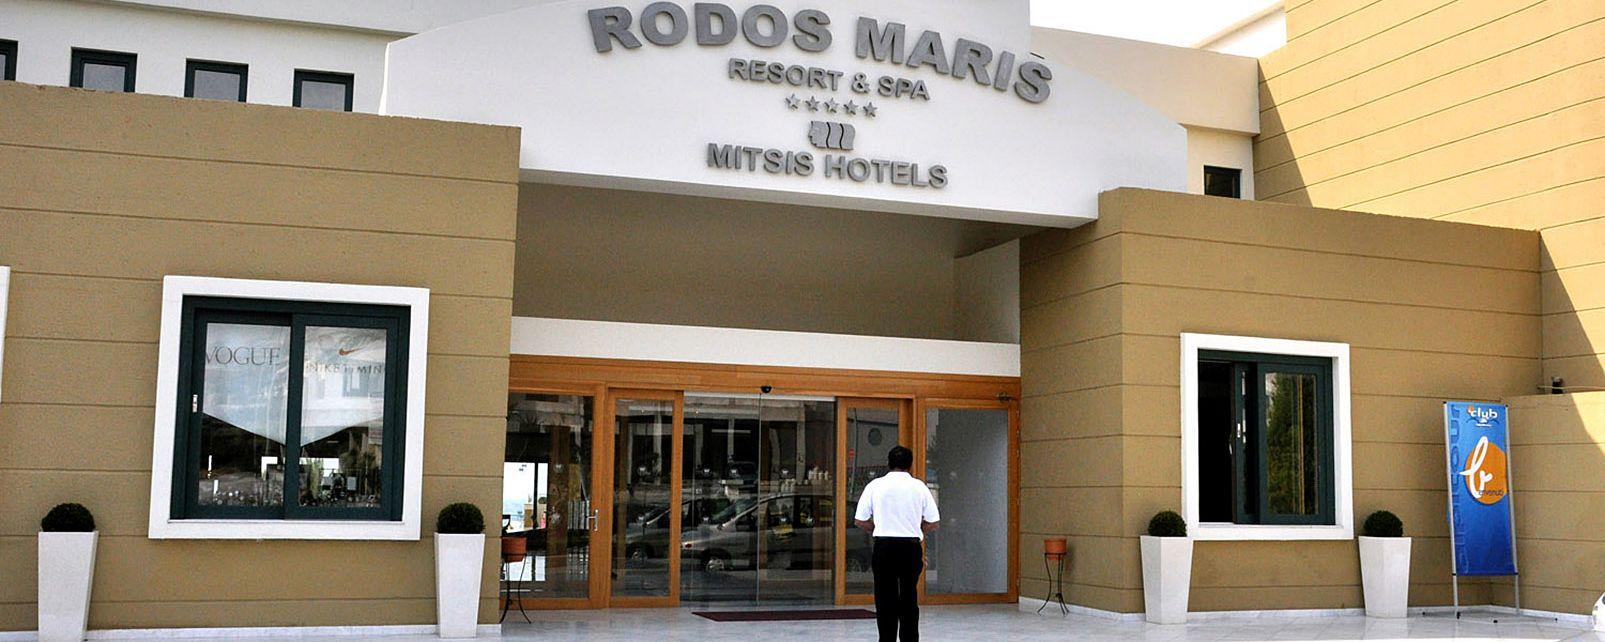 Hotel Sentido Mitsis Rodos Maris